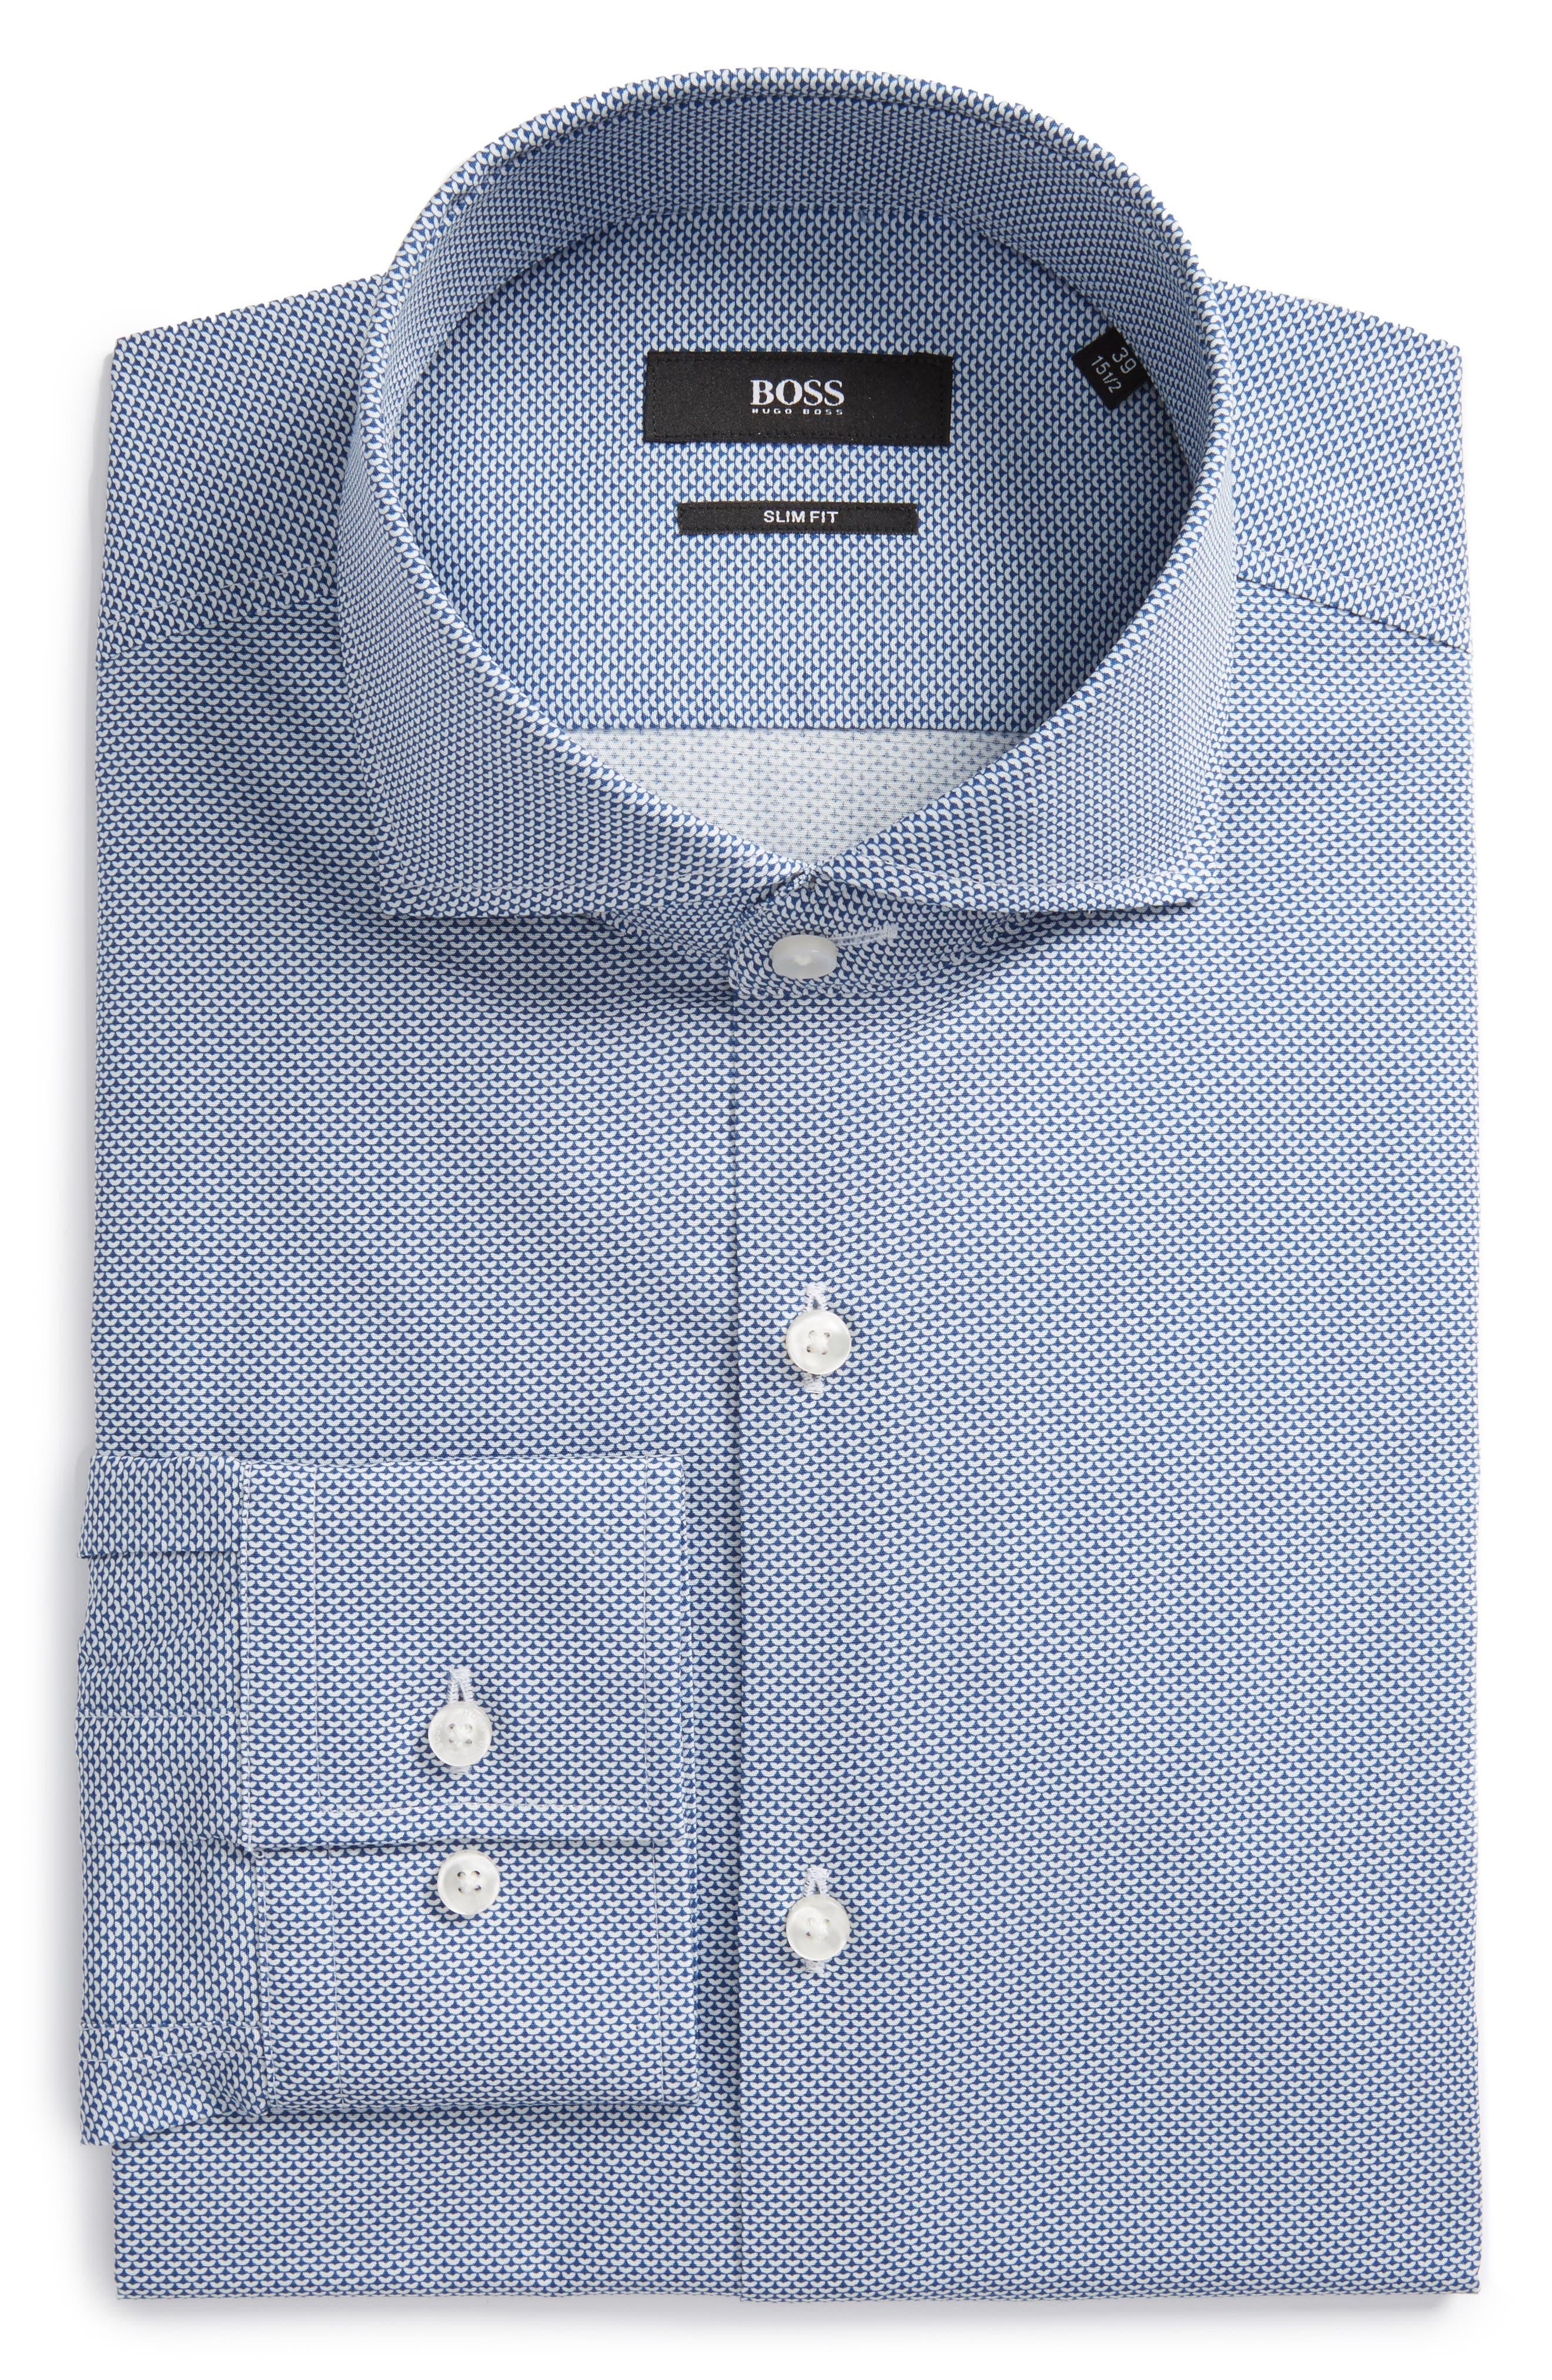 Jason Slim Fit Print Dress Shirt,                             Main thumbnail 1, color,